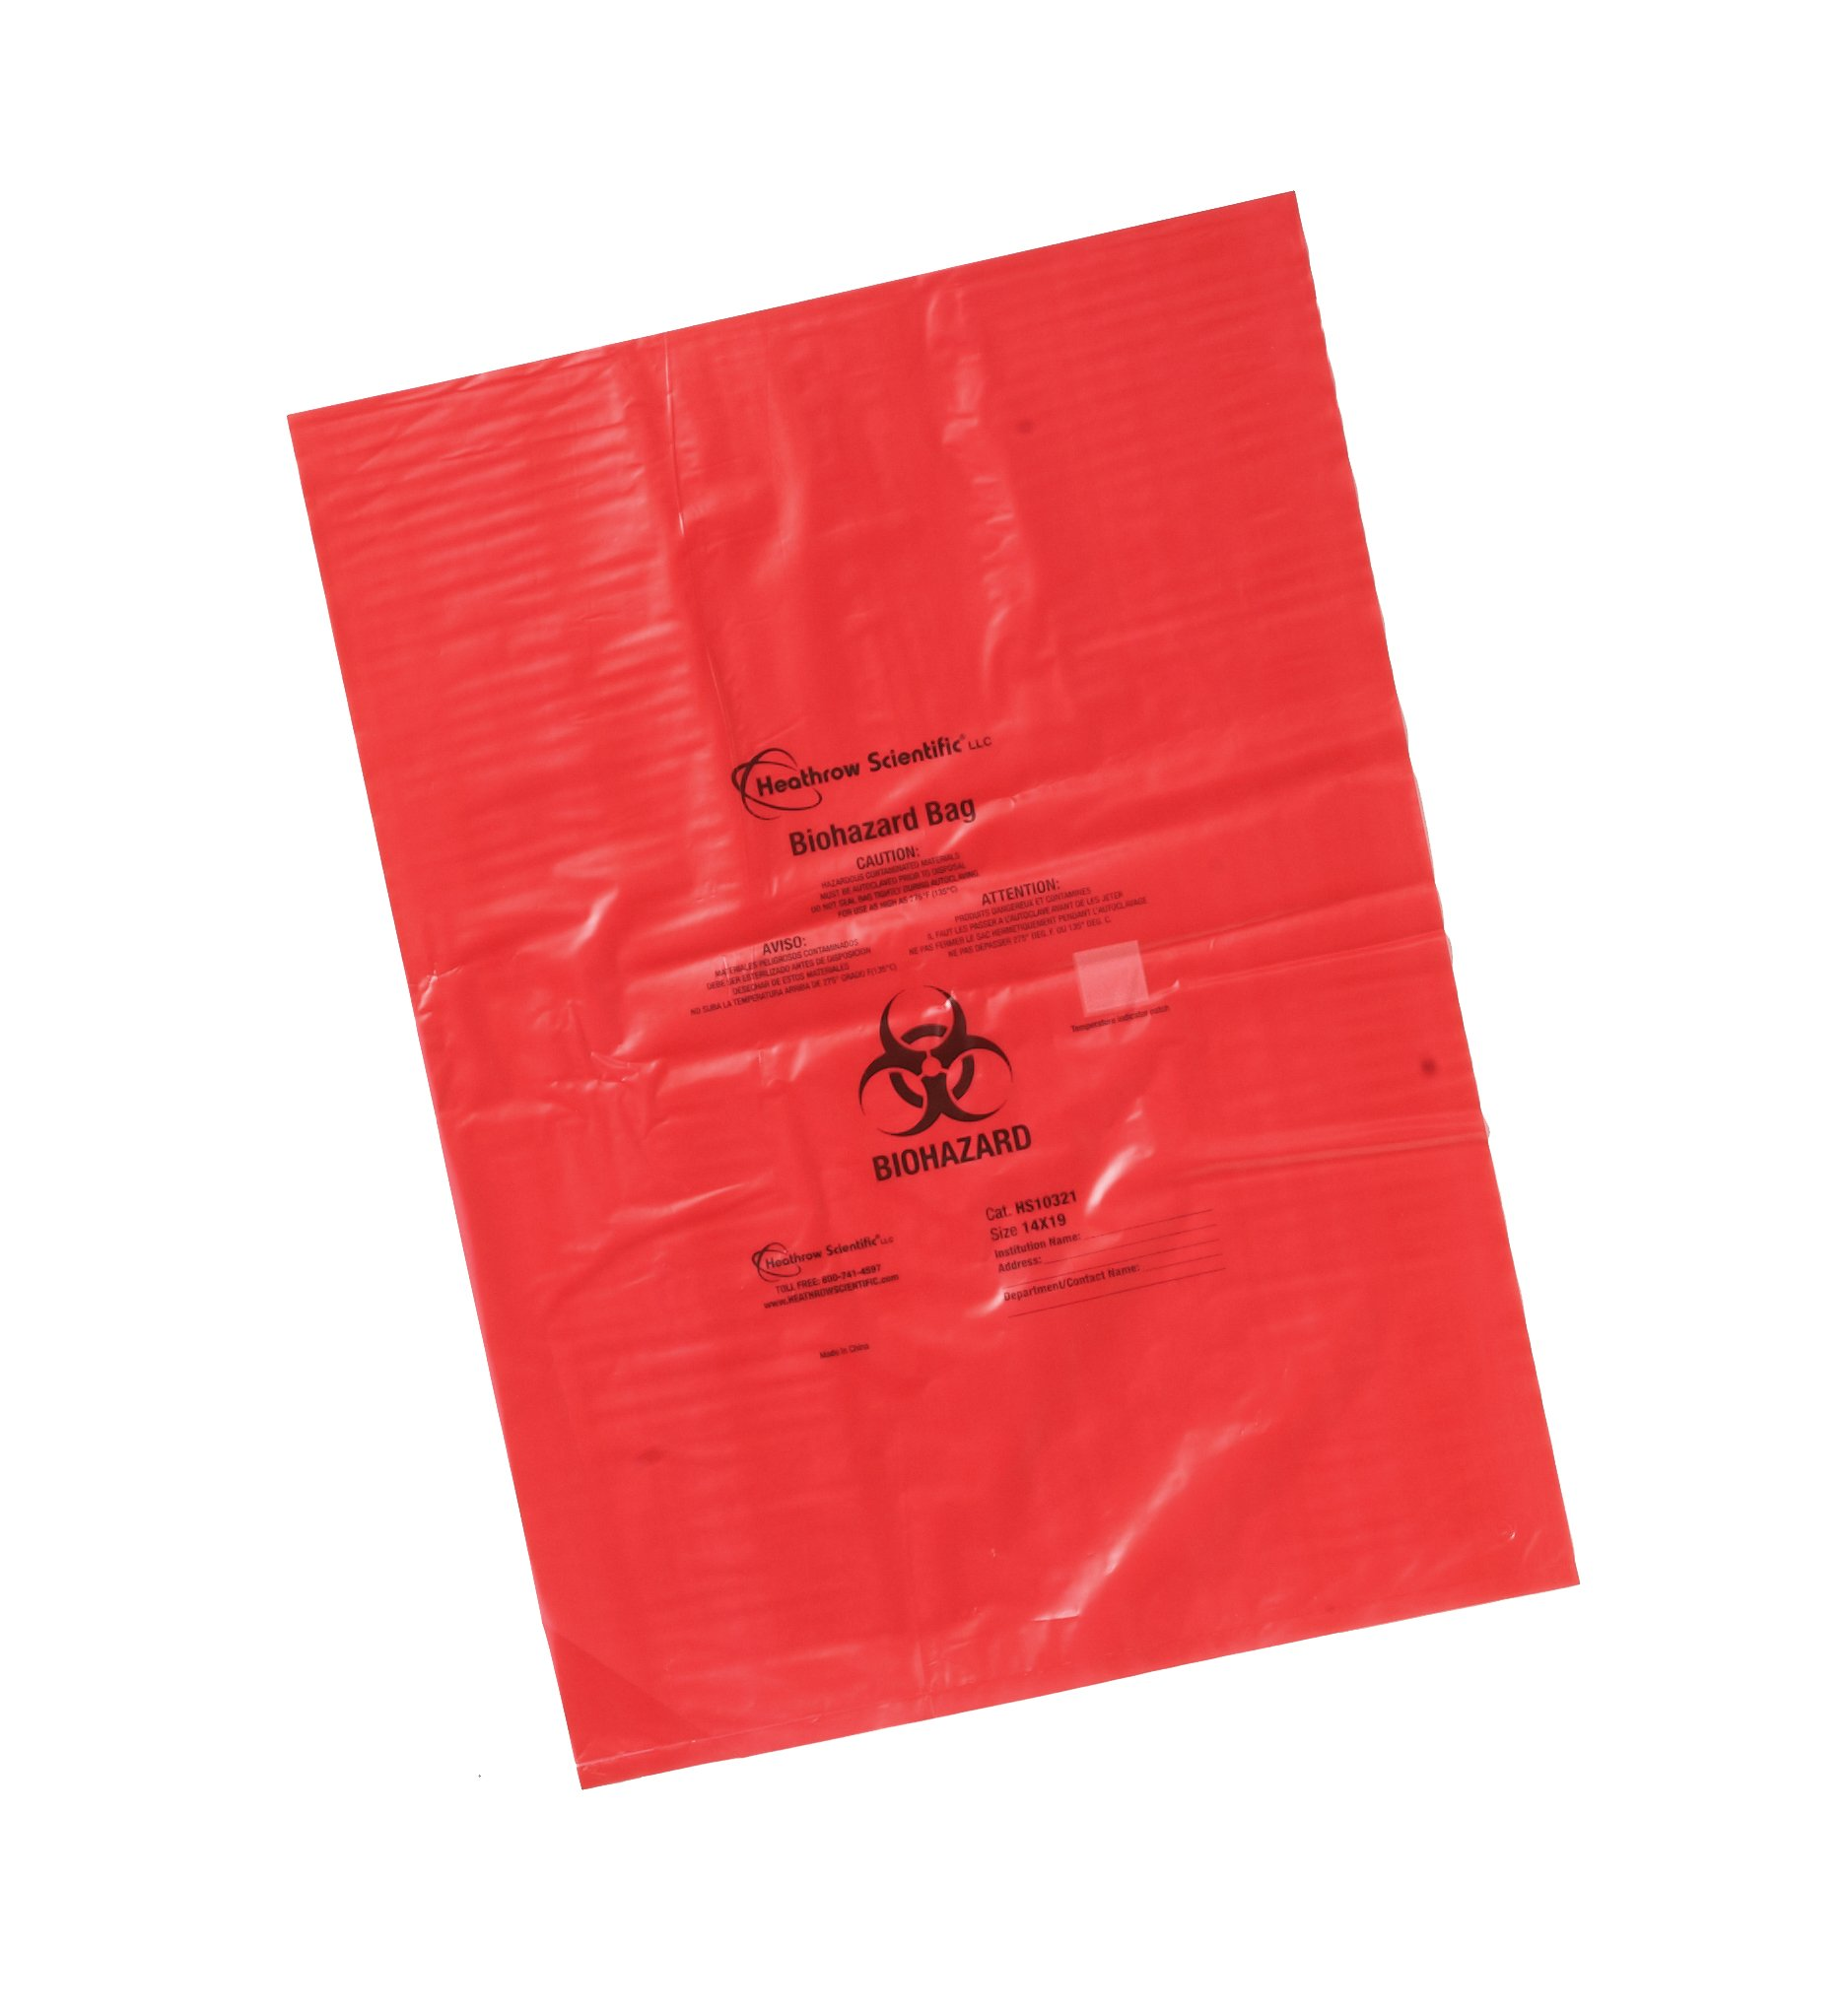 Heathrow Scientific HS10320 Biohazard Disposable Bag, 8'' x 12'', Red